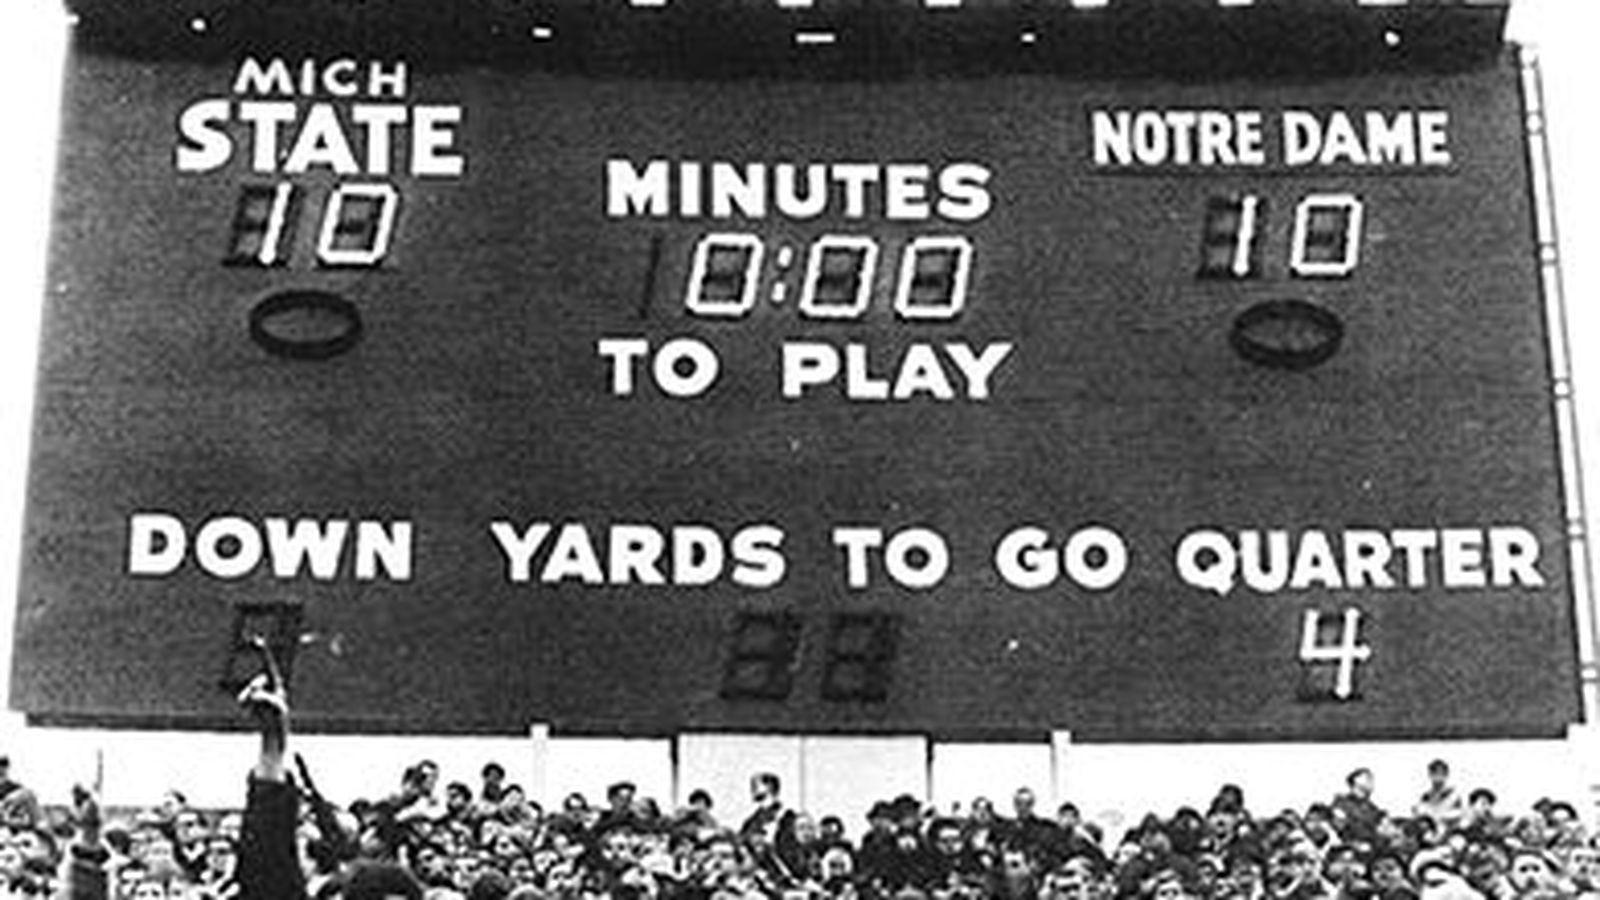 Notre Dame vs  Michigan State: Clone Wars - One Foot Down